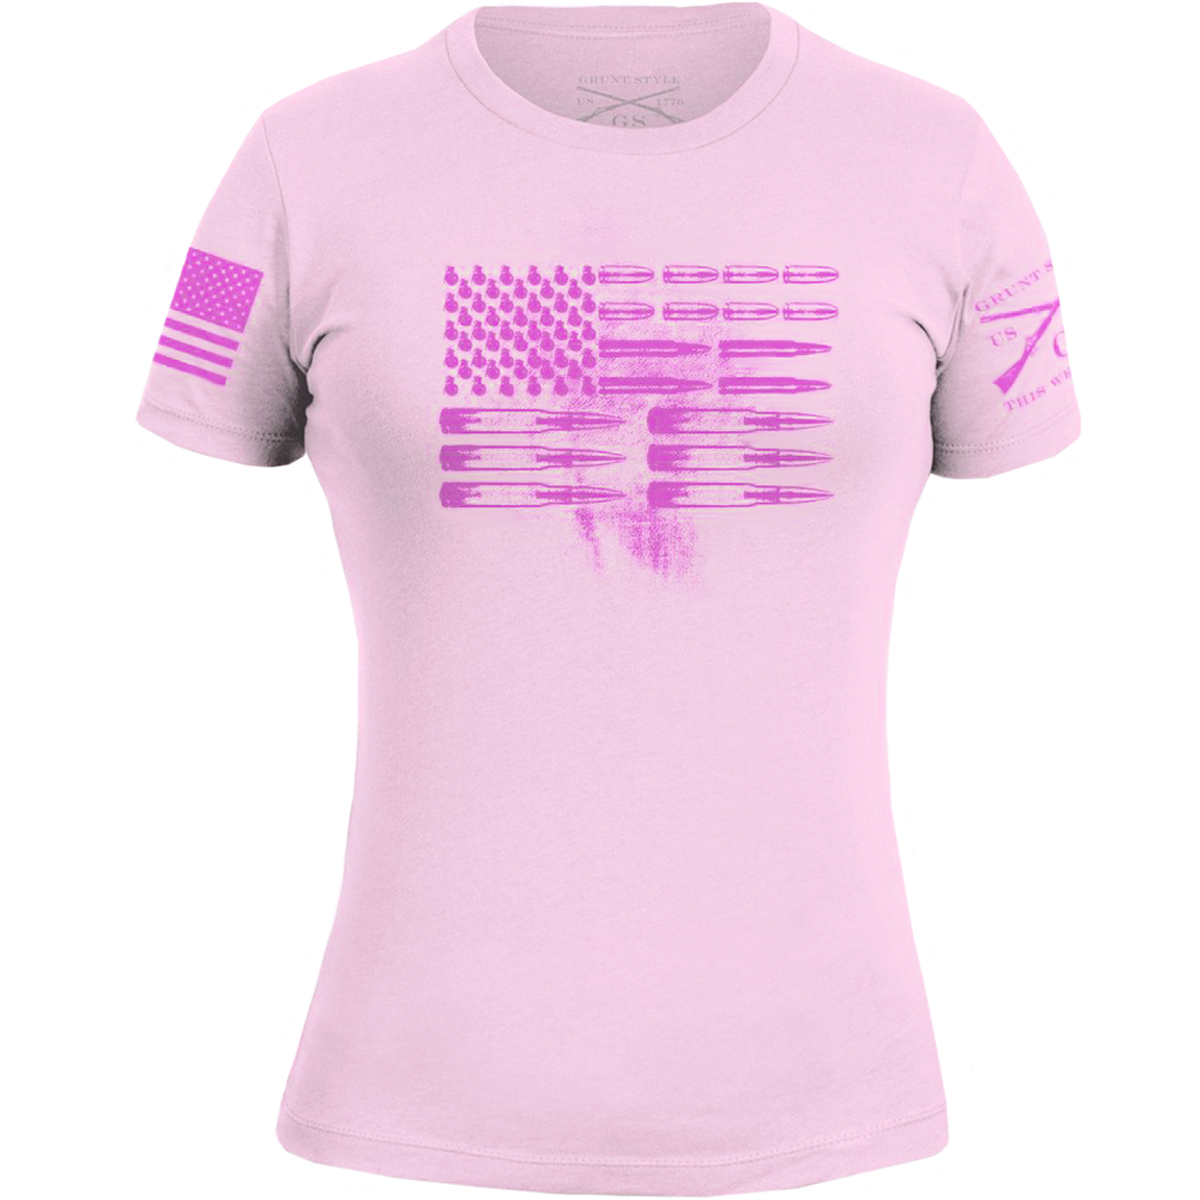 dfebc8bcb Grunt Style Women's Ammo Flag T-Shirt - Small - Pink